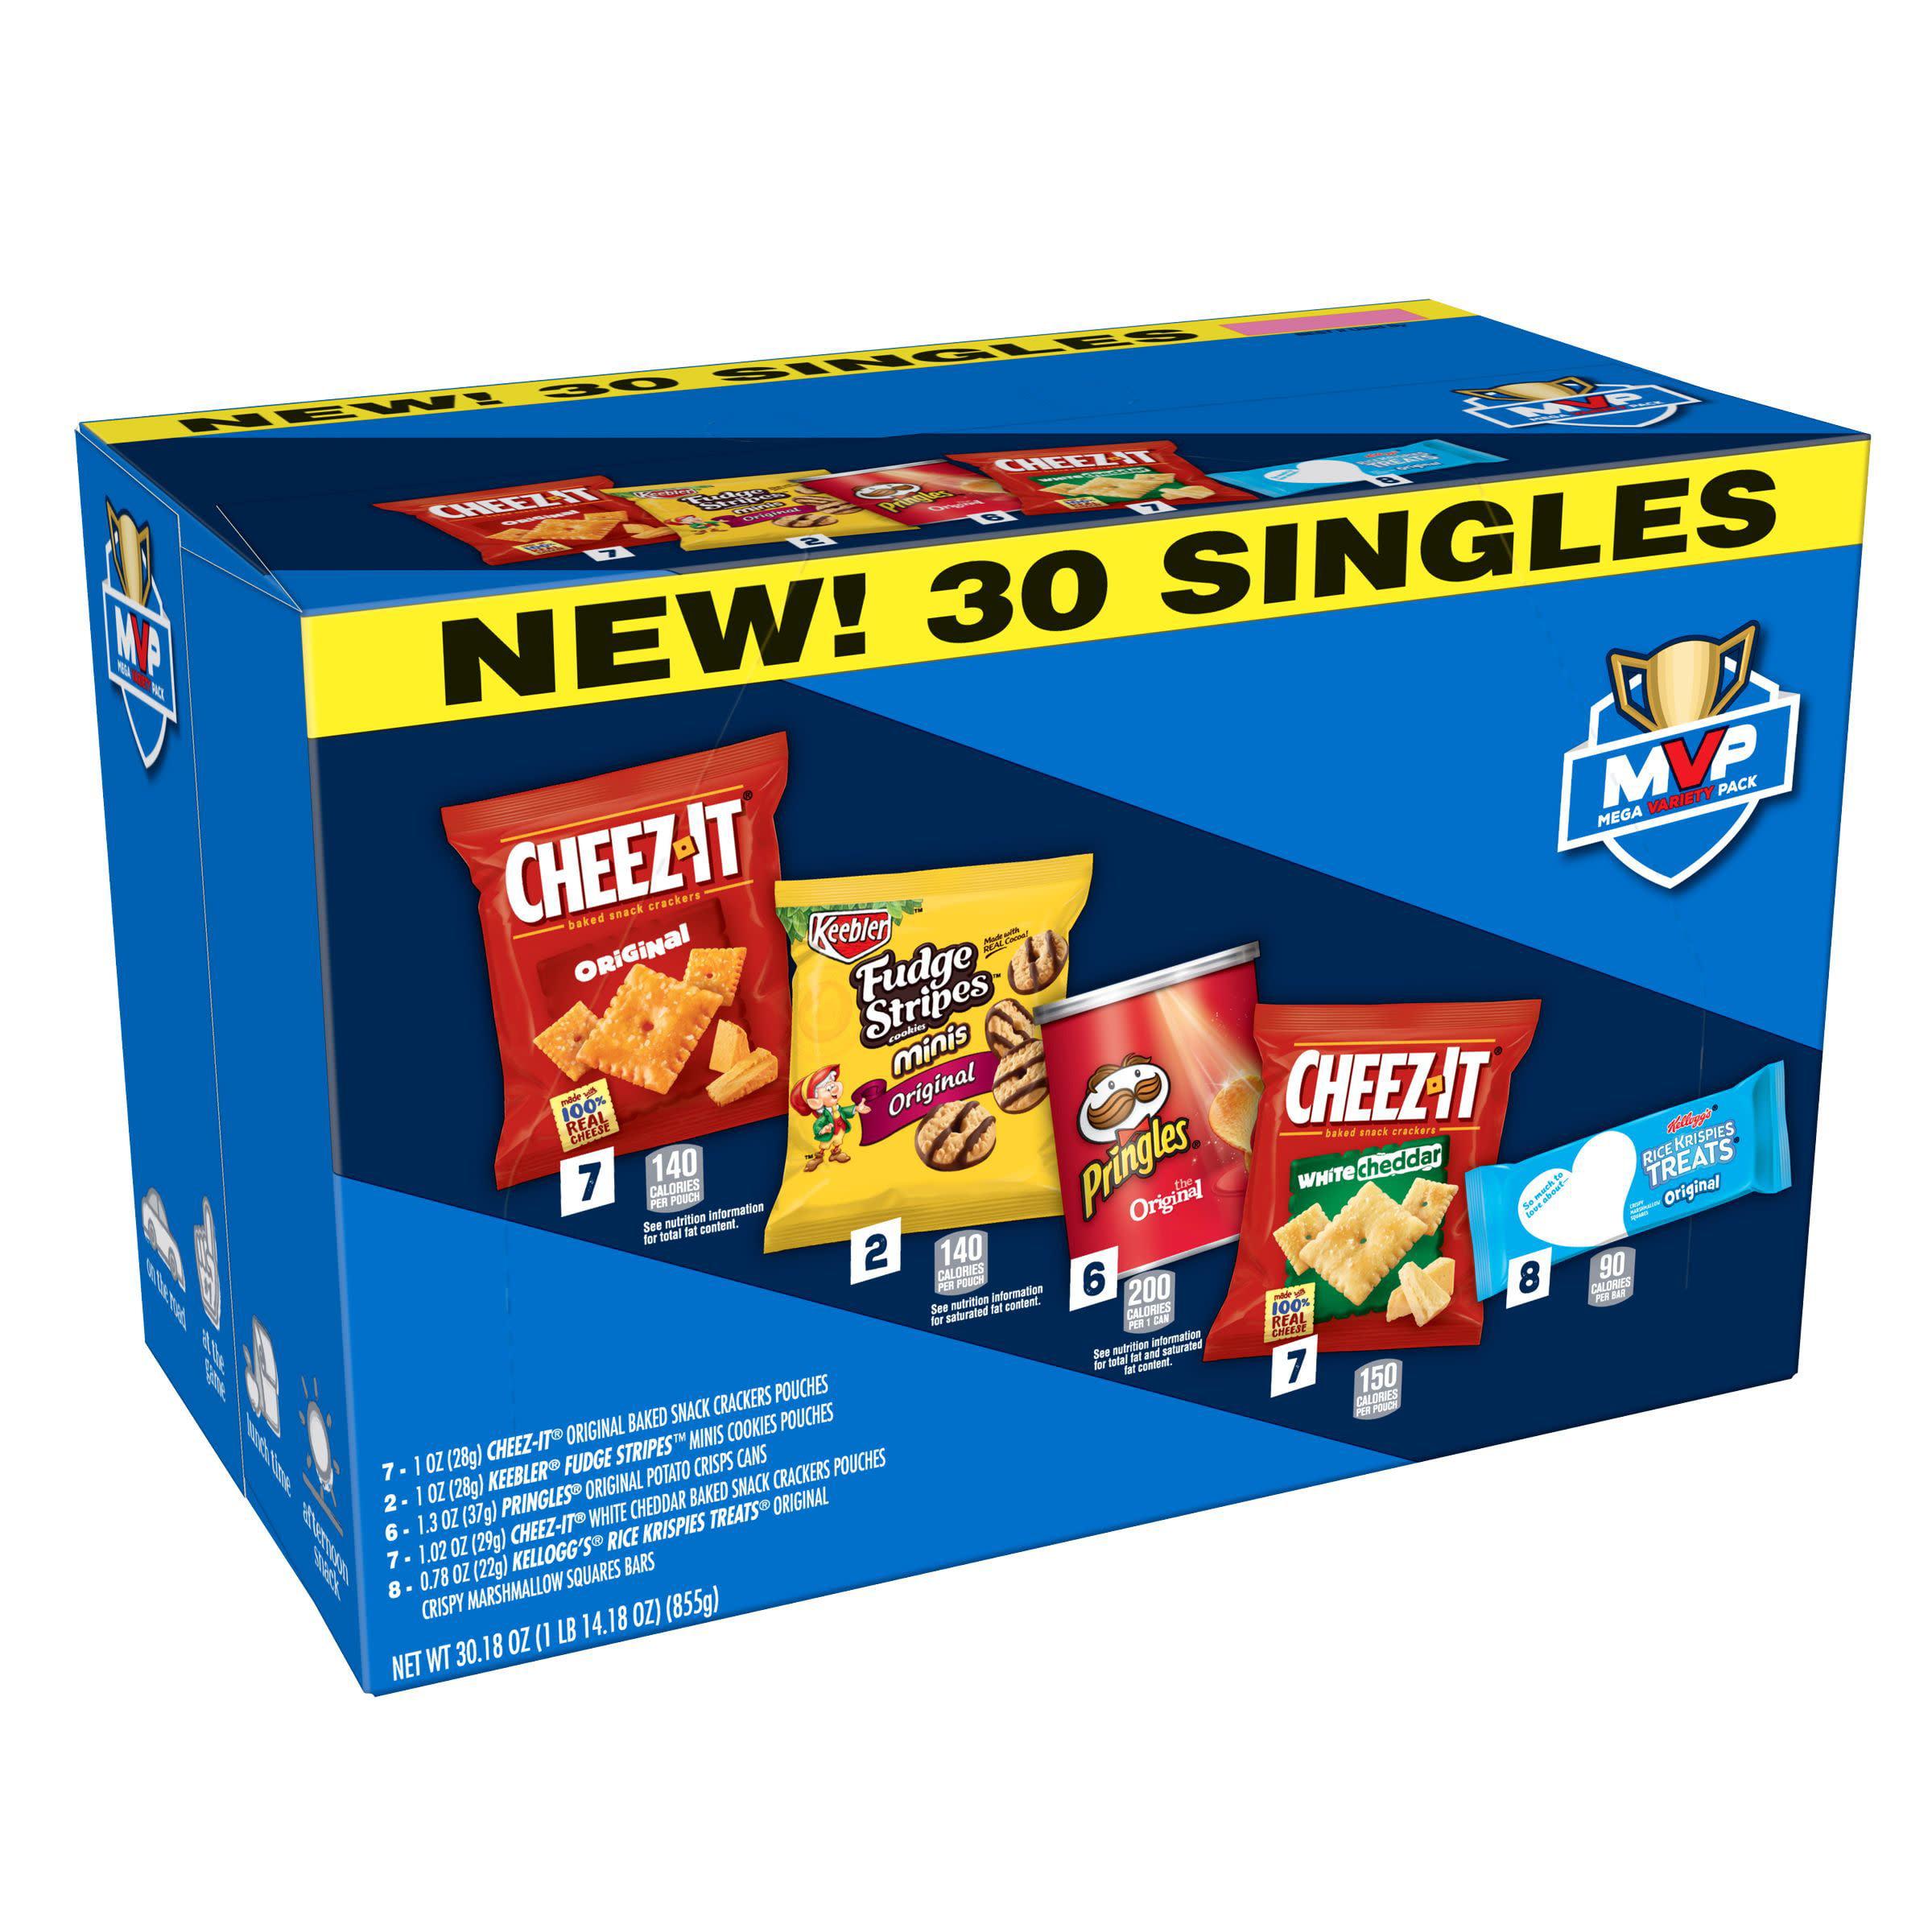 Kellogg's Mega Variety Pack Snacks 30.18 oz. 30 Ct Box